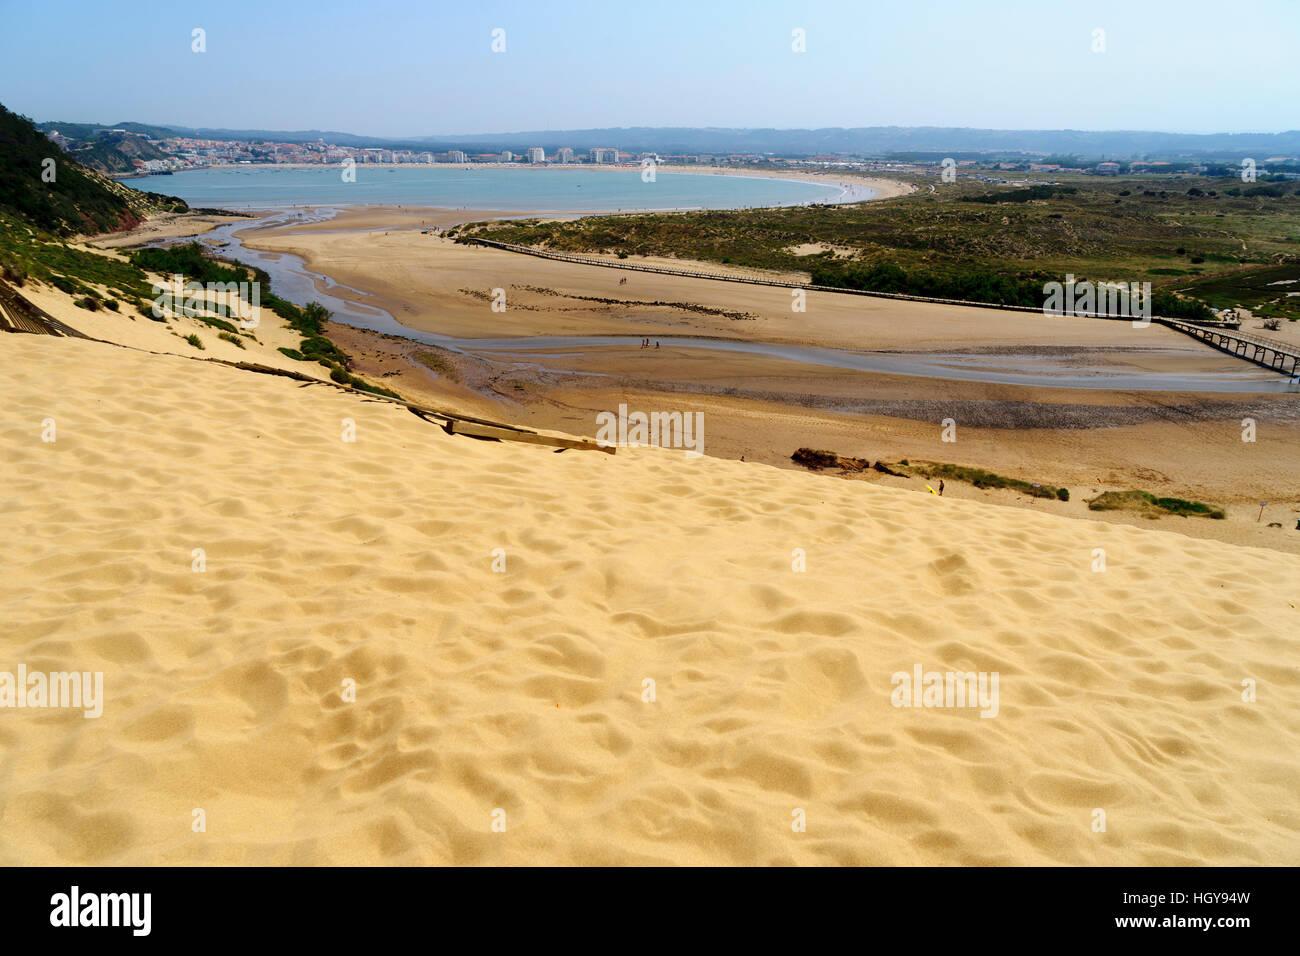 Salir do Porto sand dunes and beach by the river Tornada where it flows into the S�o Martinho bay Silver Coast Portugal - Stock Image